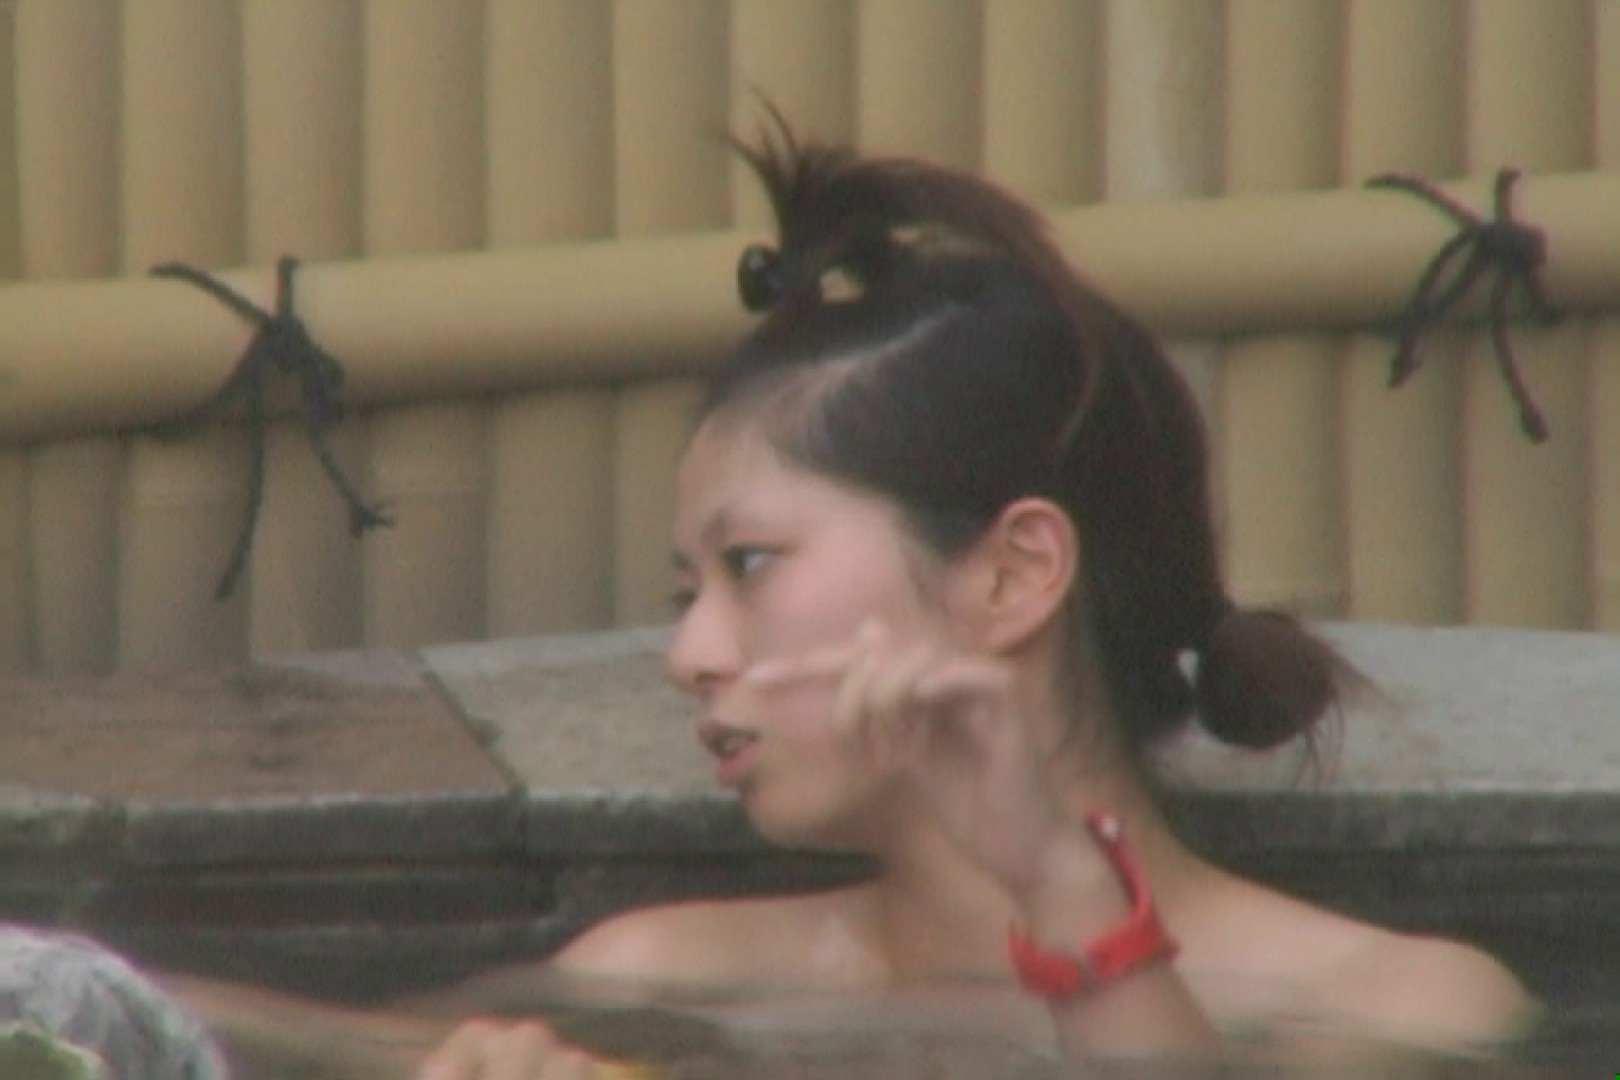 Aquaな露天風呂Vol.610 HなOL | 露天  56pic 27